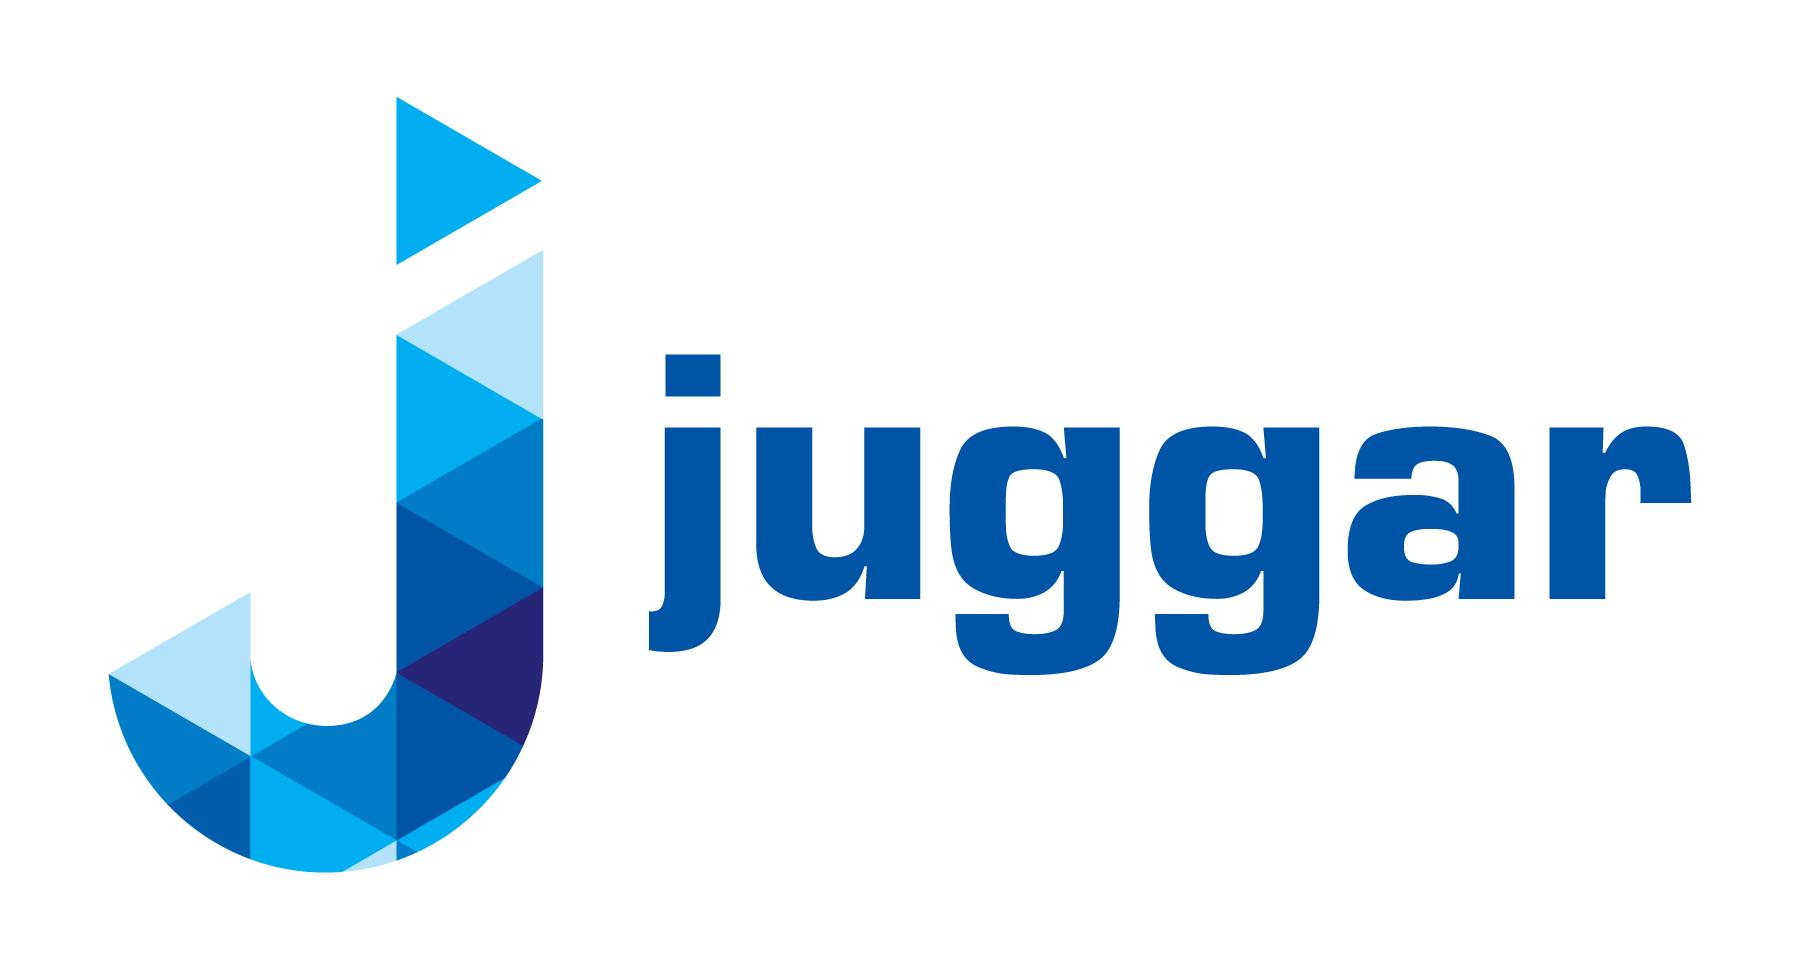 Juggar company logo